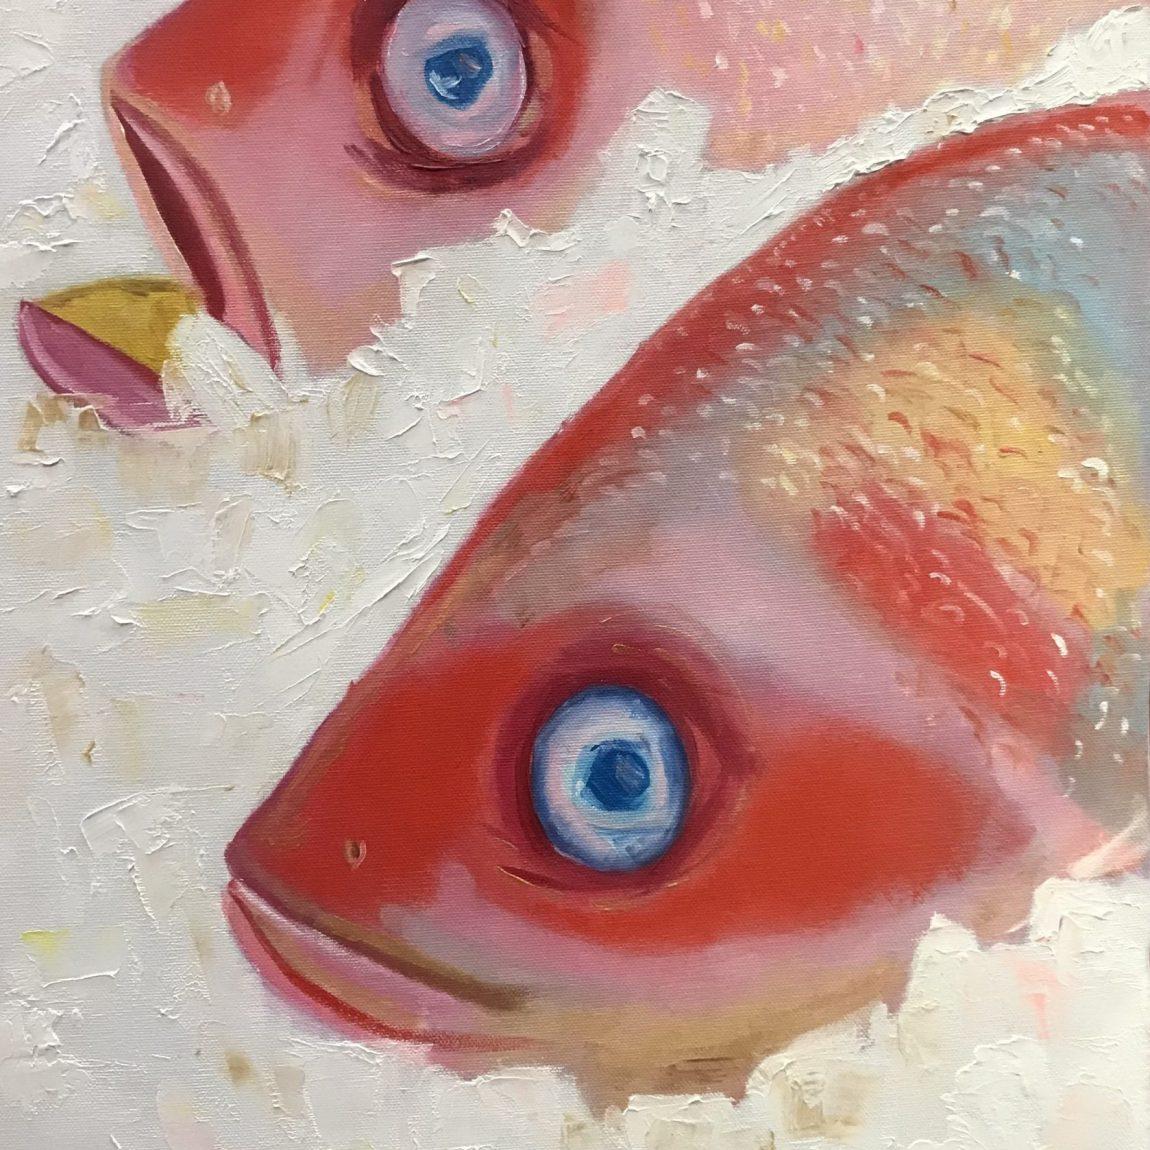 Kristine Veisa - Tuval Üzeri Yağlı Boya - Ölçü : 40 x 60 cm - Fiyat : 900 TL